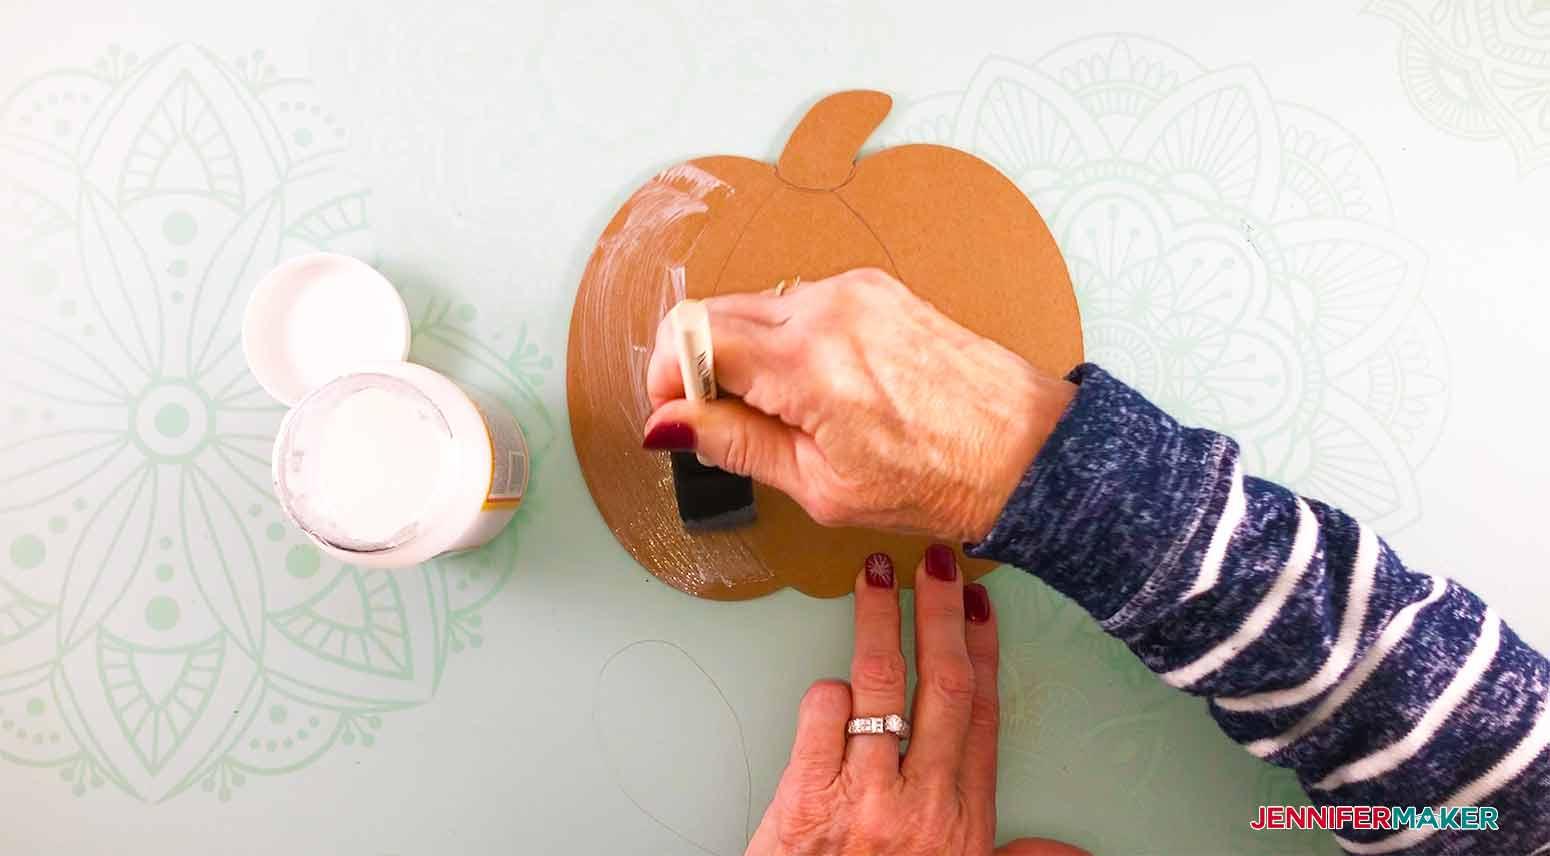 Home-Board-Jennifermaker-apply-mod-podge-to-shape